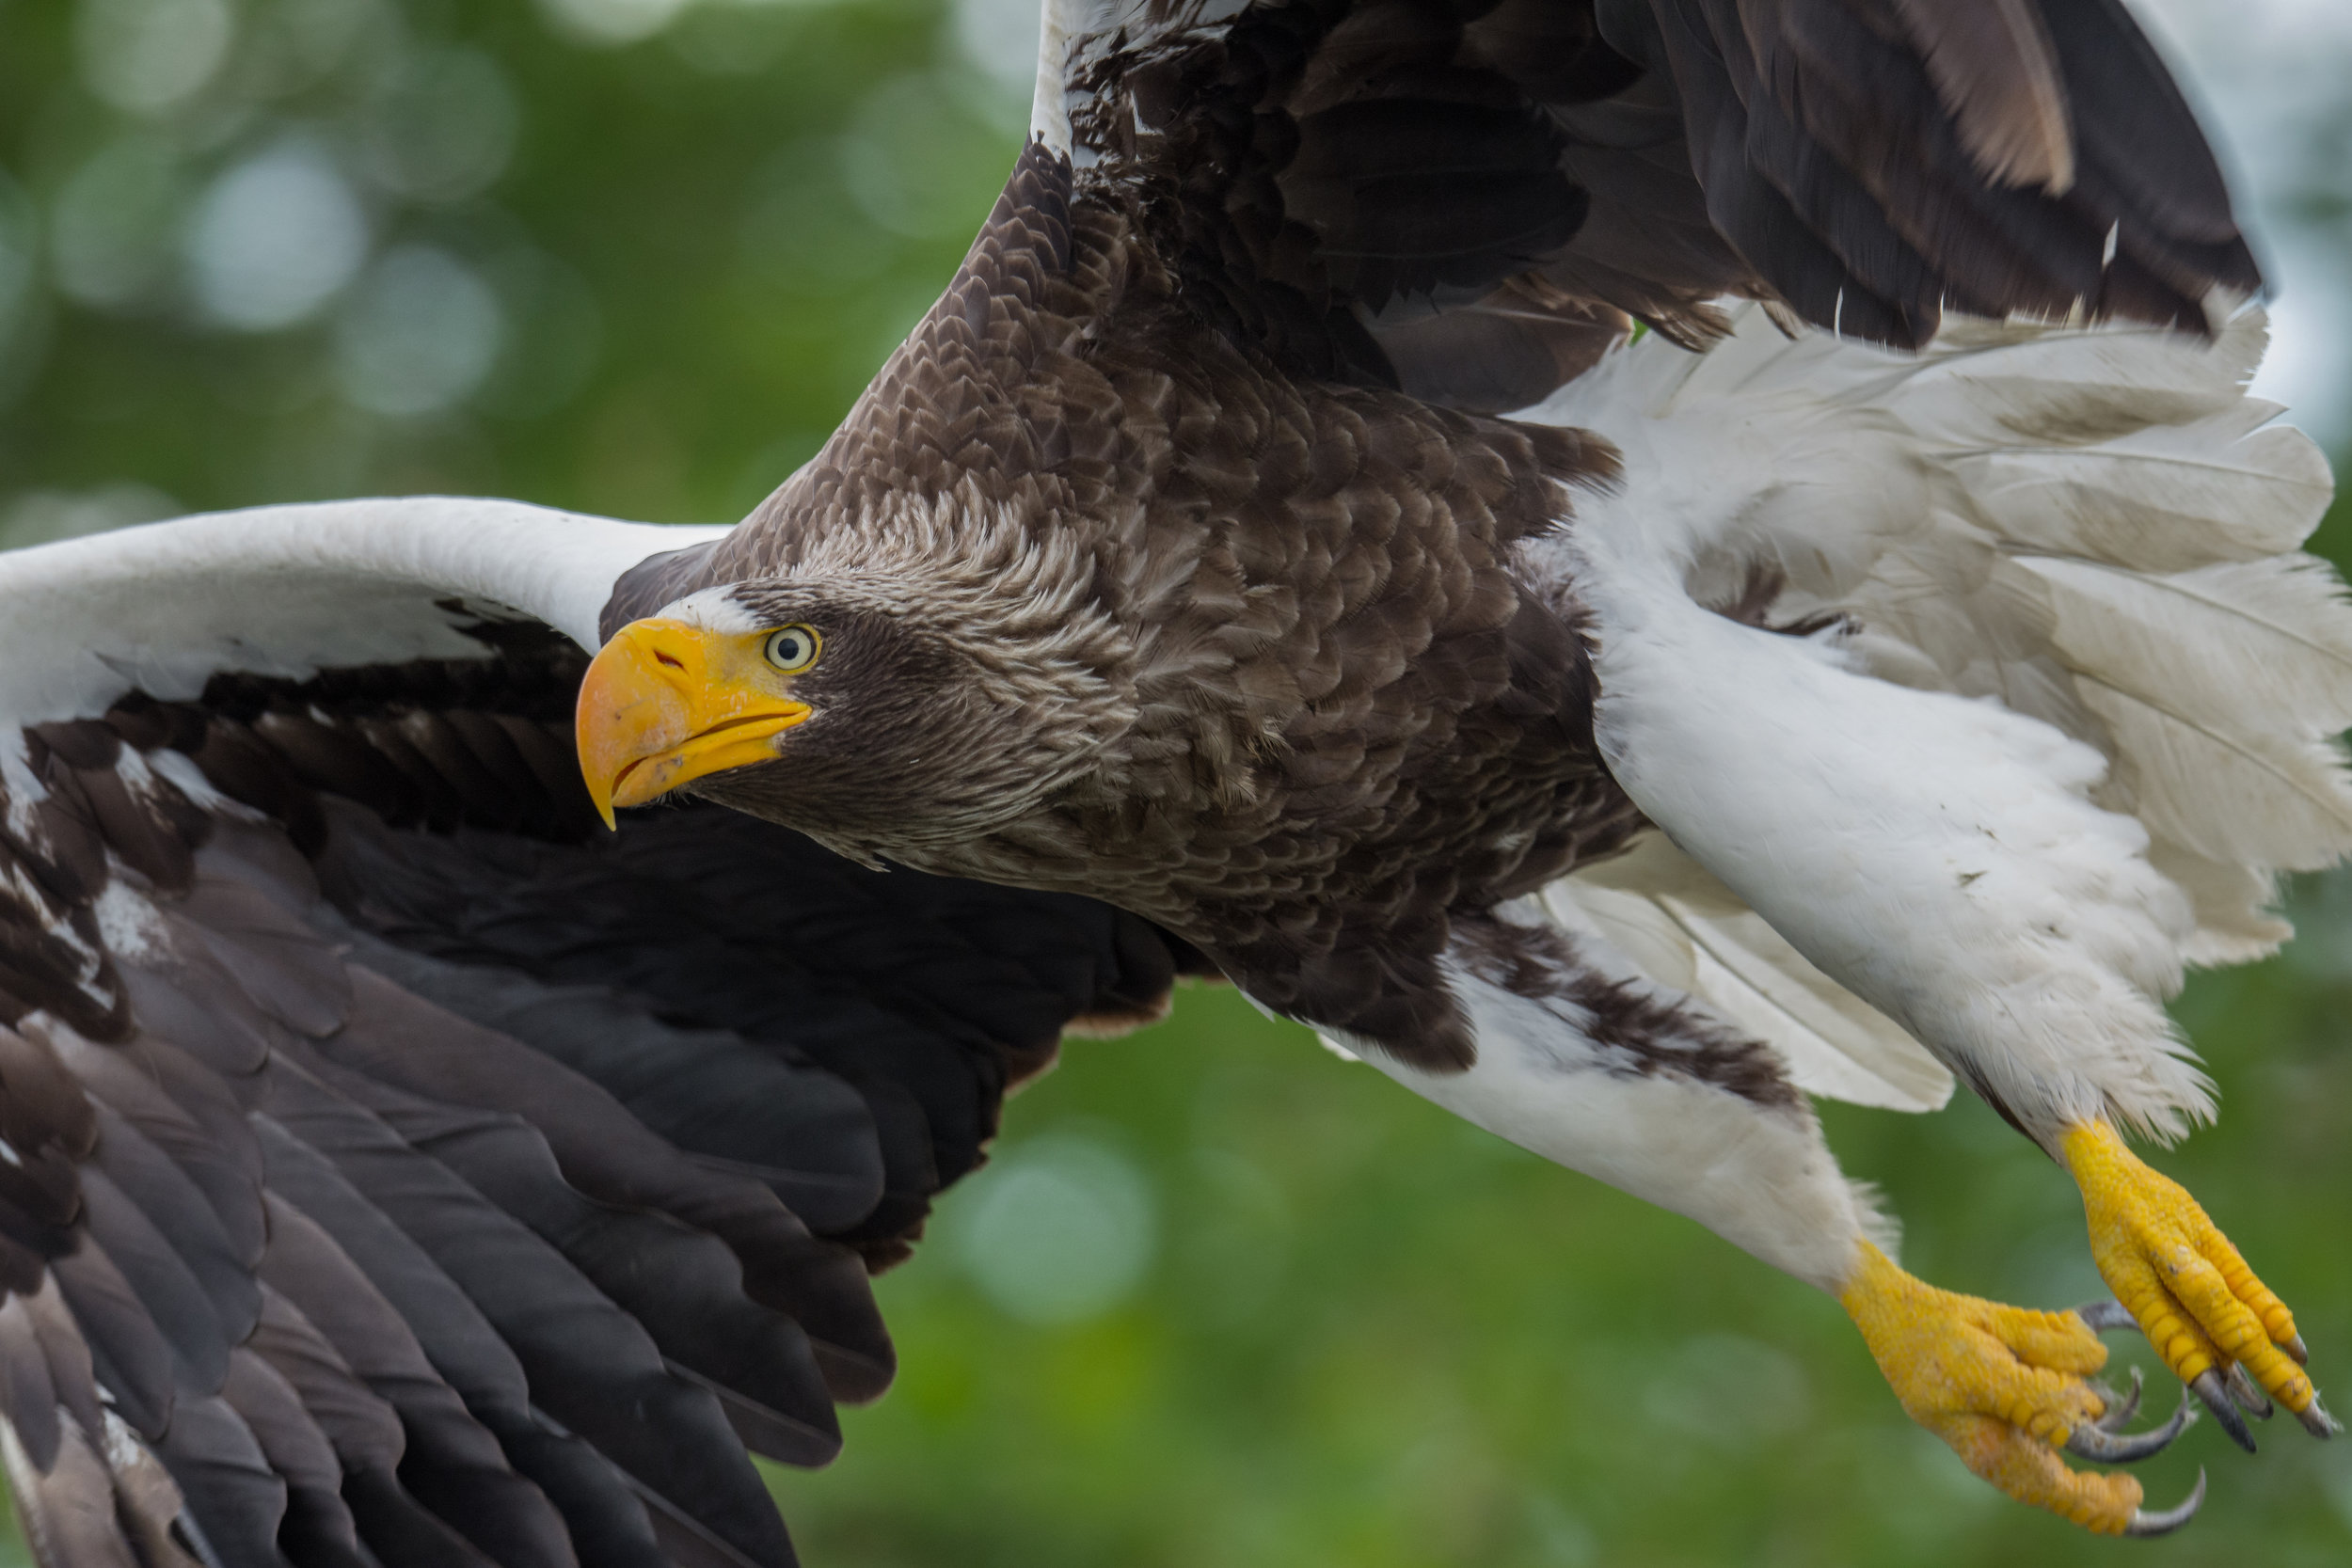 Steller's Sea-Eagle (Haliaeetus pelagicus), Zhupanova River, KAM (RU)